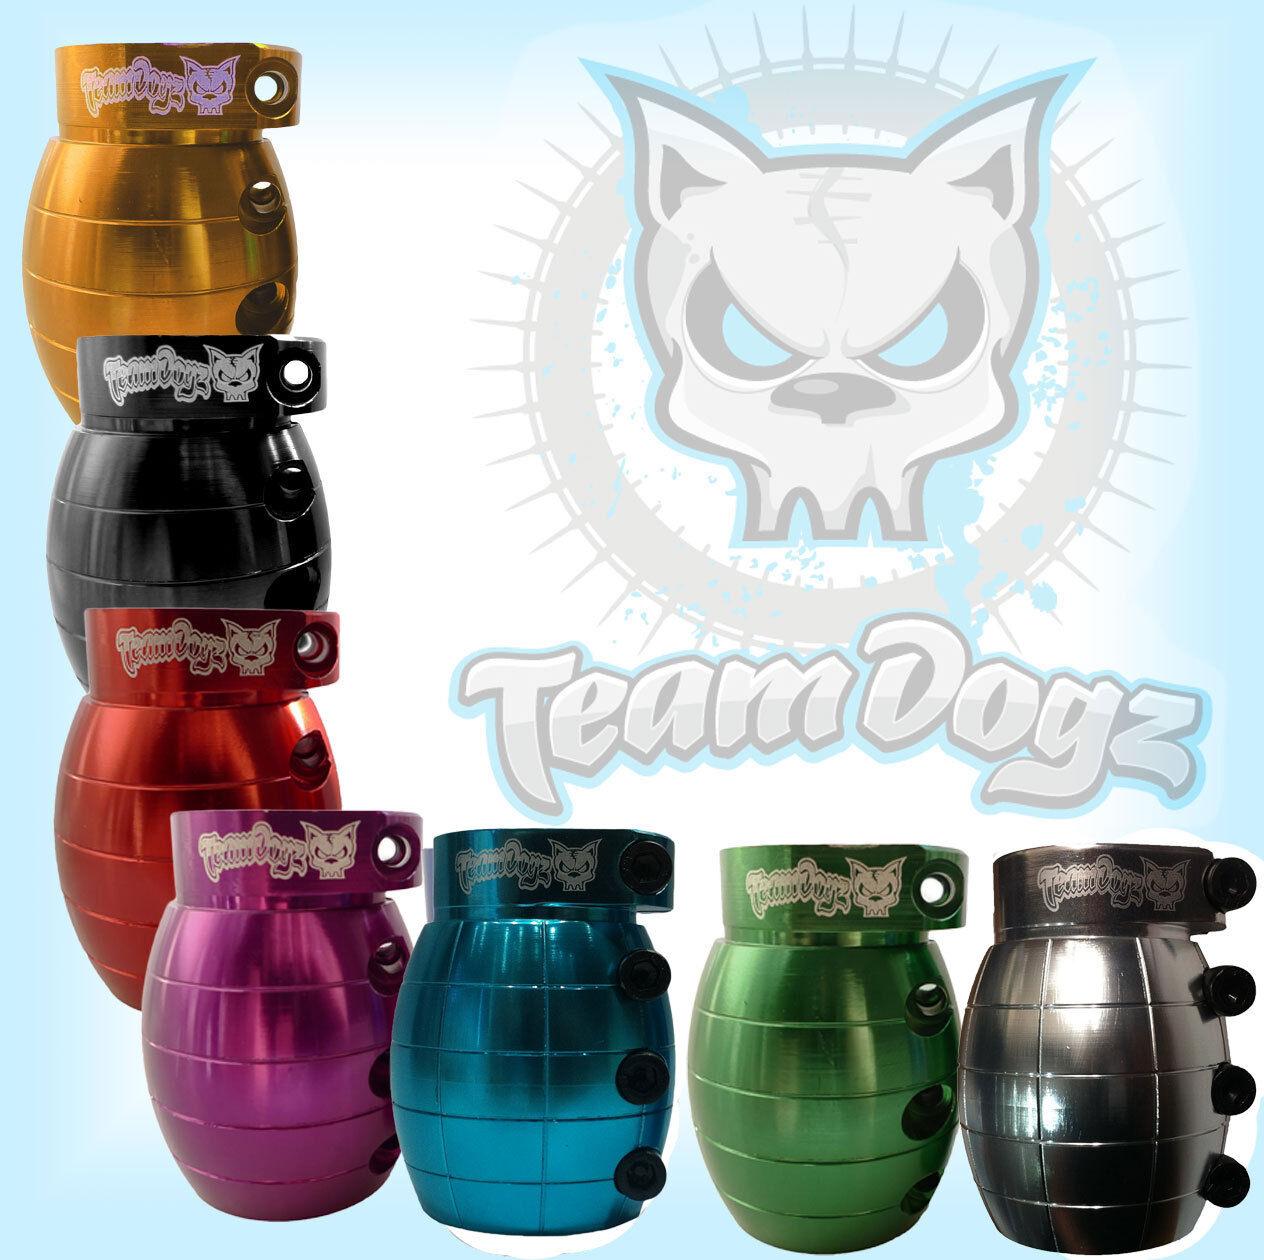 Team Dogz Grenade Pro Roller Klemme Passungen MGP Slamm Rasierer Blazer JD-Bug  | Merkwürdige Form